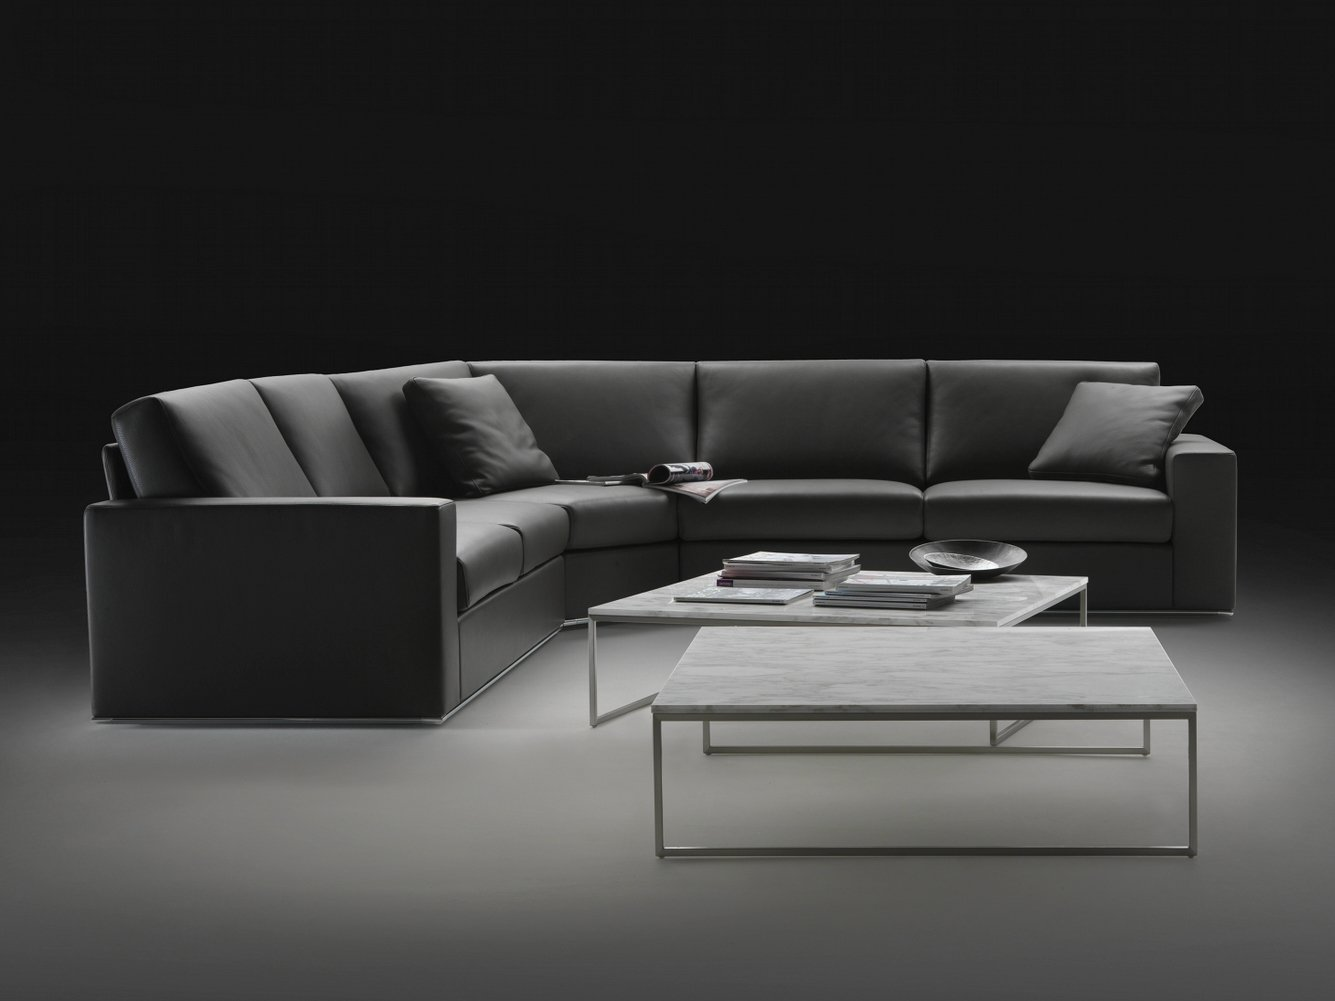 canap composable modulable en cuir milano by giulio marelli italia design studio crgm. Black Bedroom Furniture Sets. Home Design Ideas